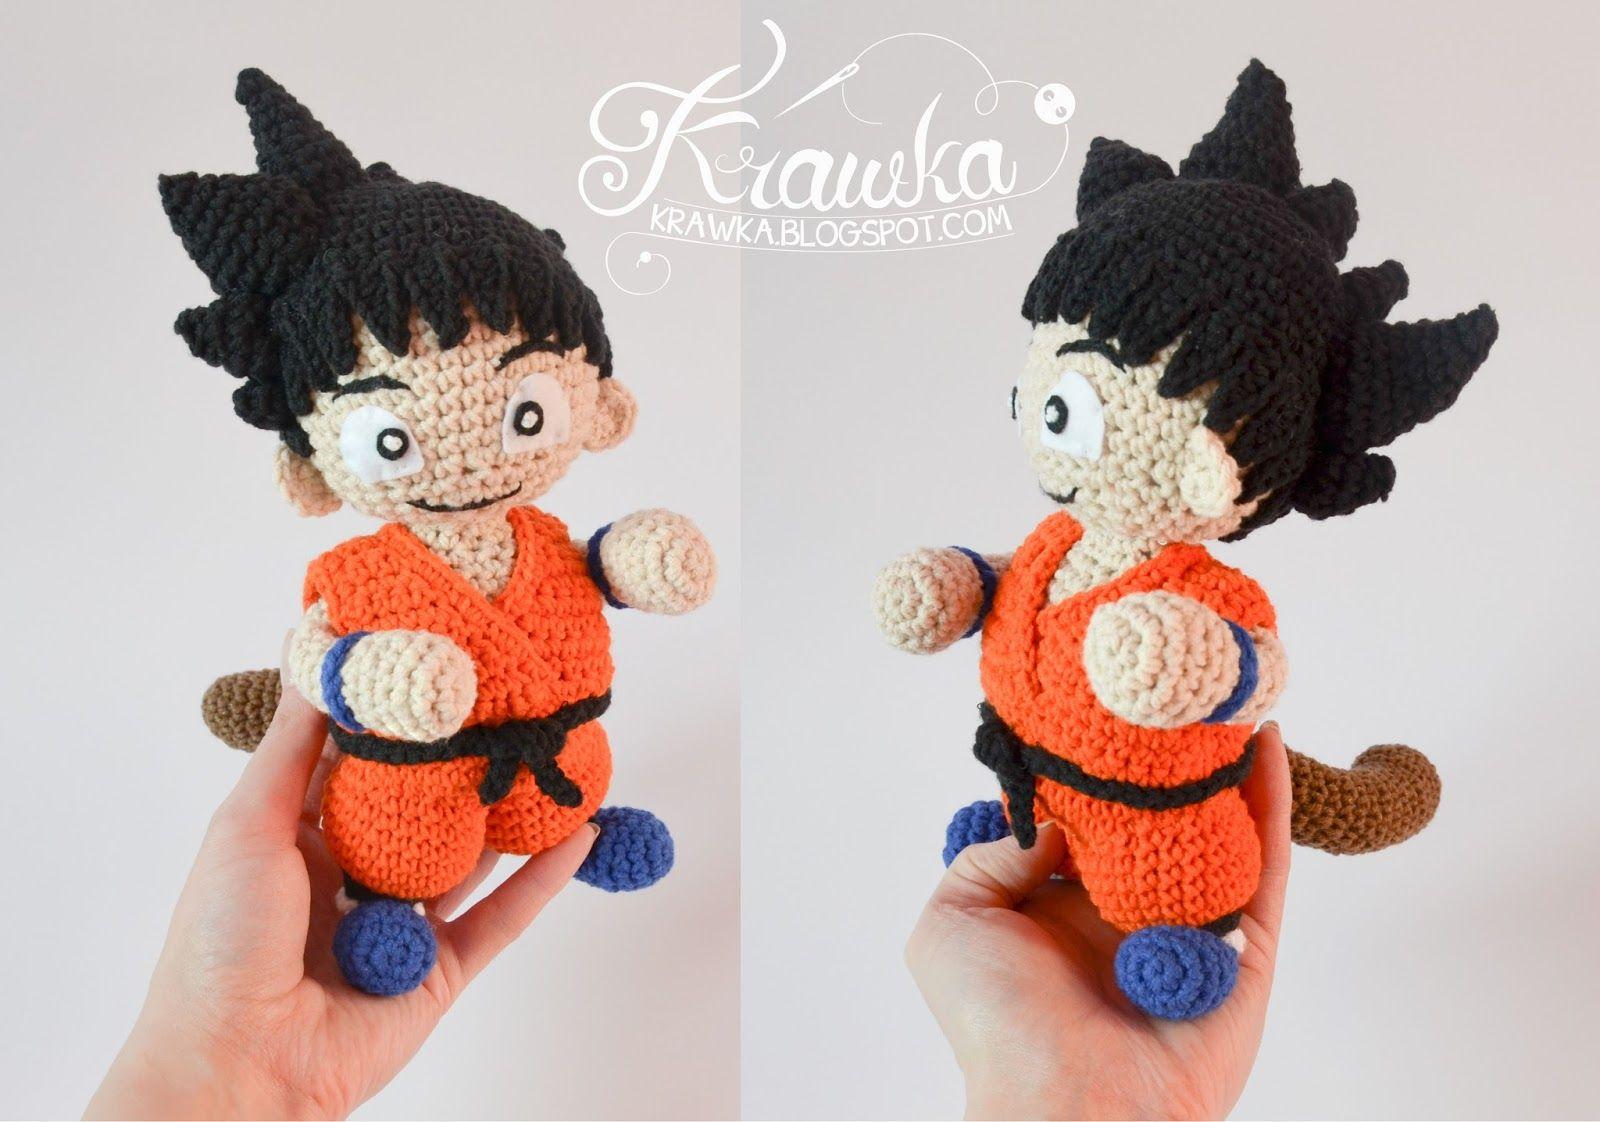 Krawka: Son Goku - Dragon Ball inspired crochet pattern by Krawka ...